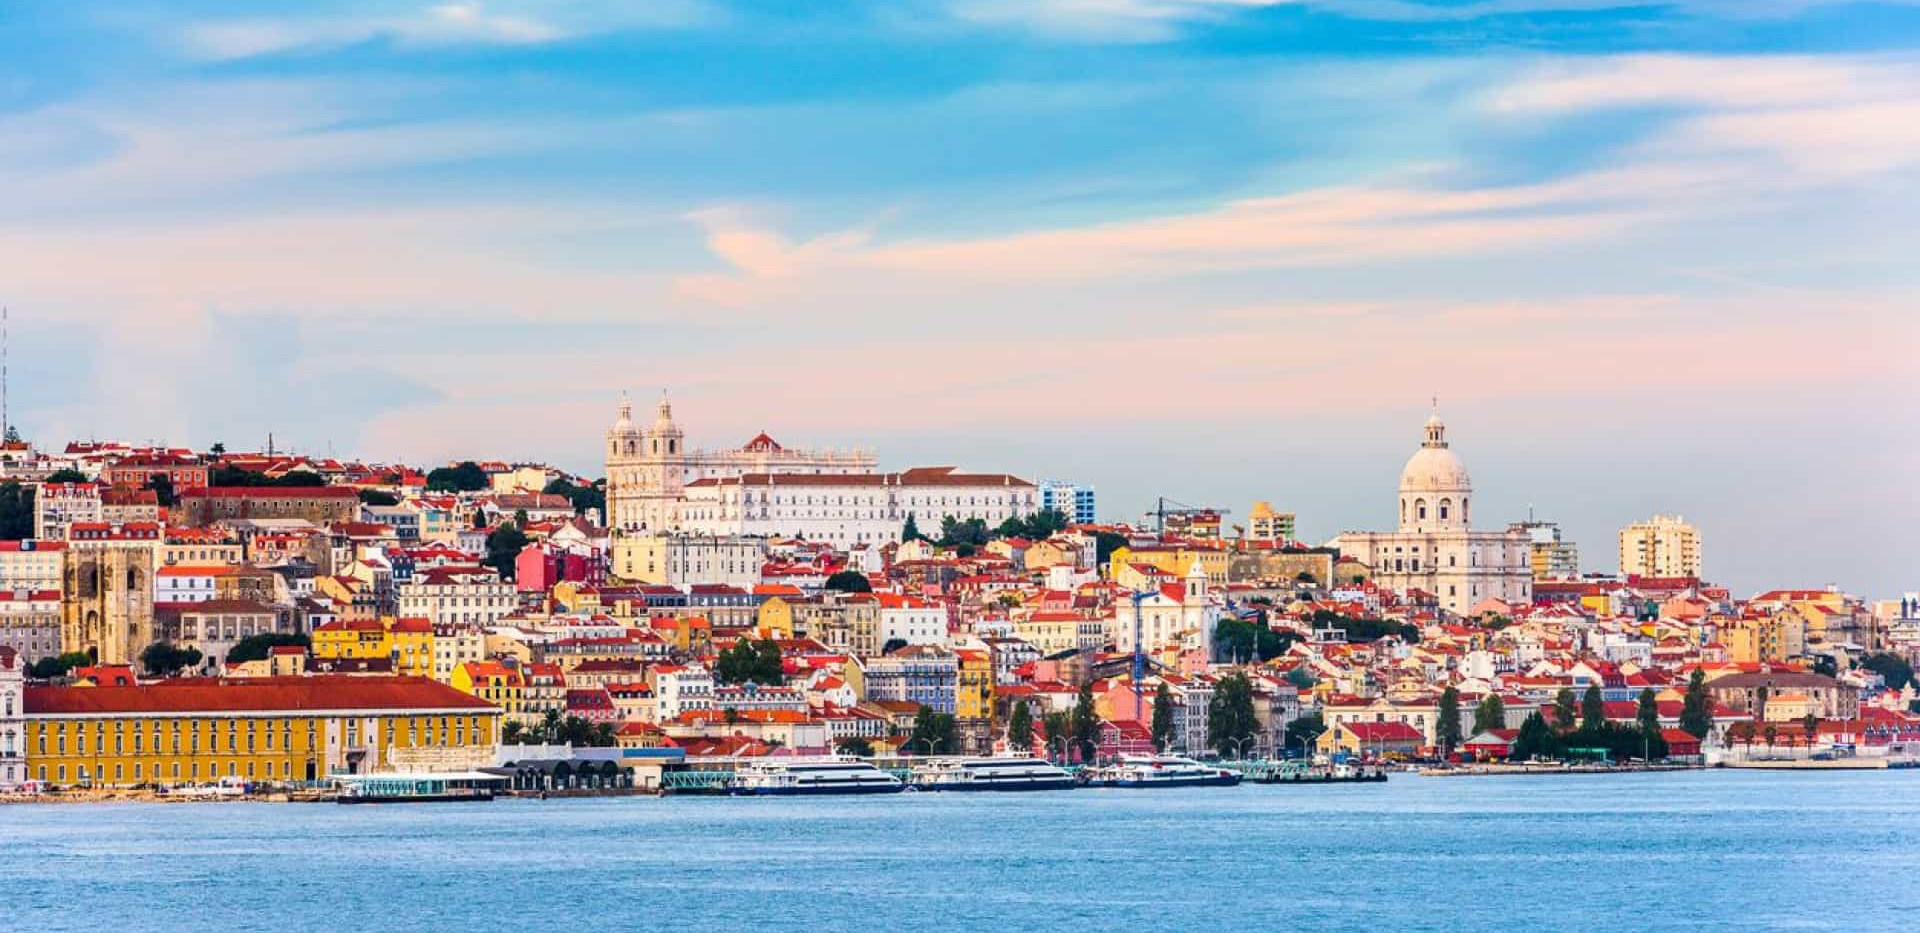 Lisbon Docks